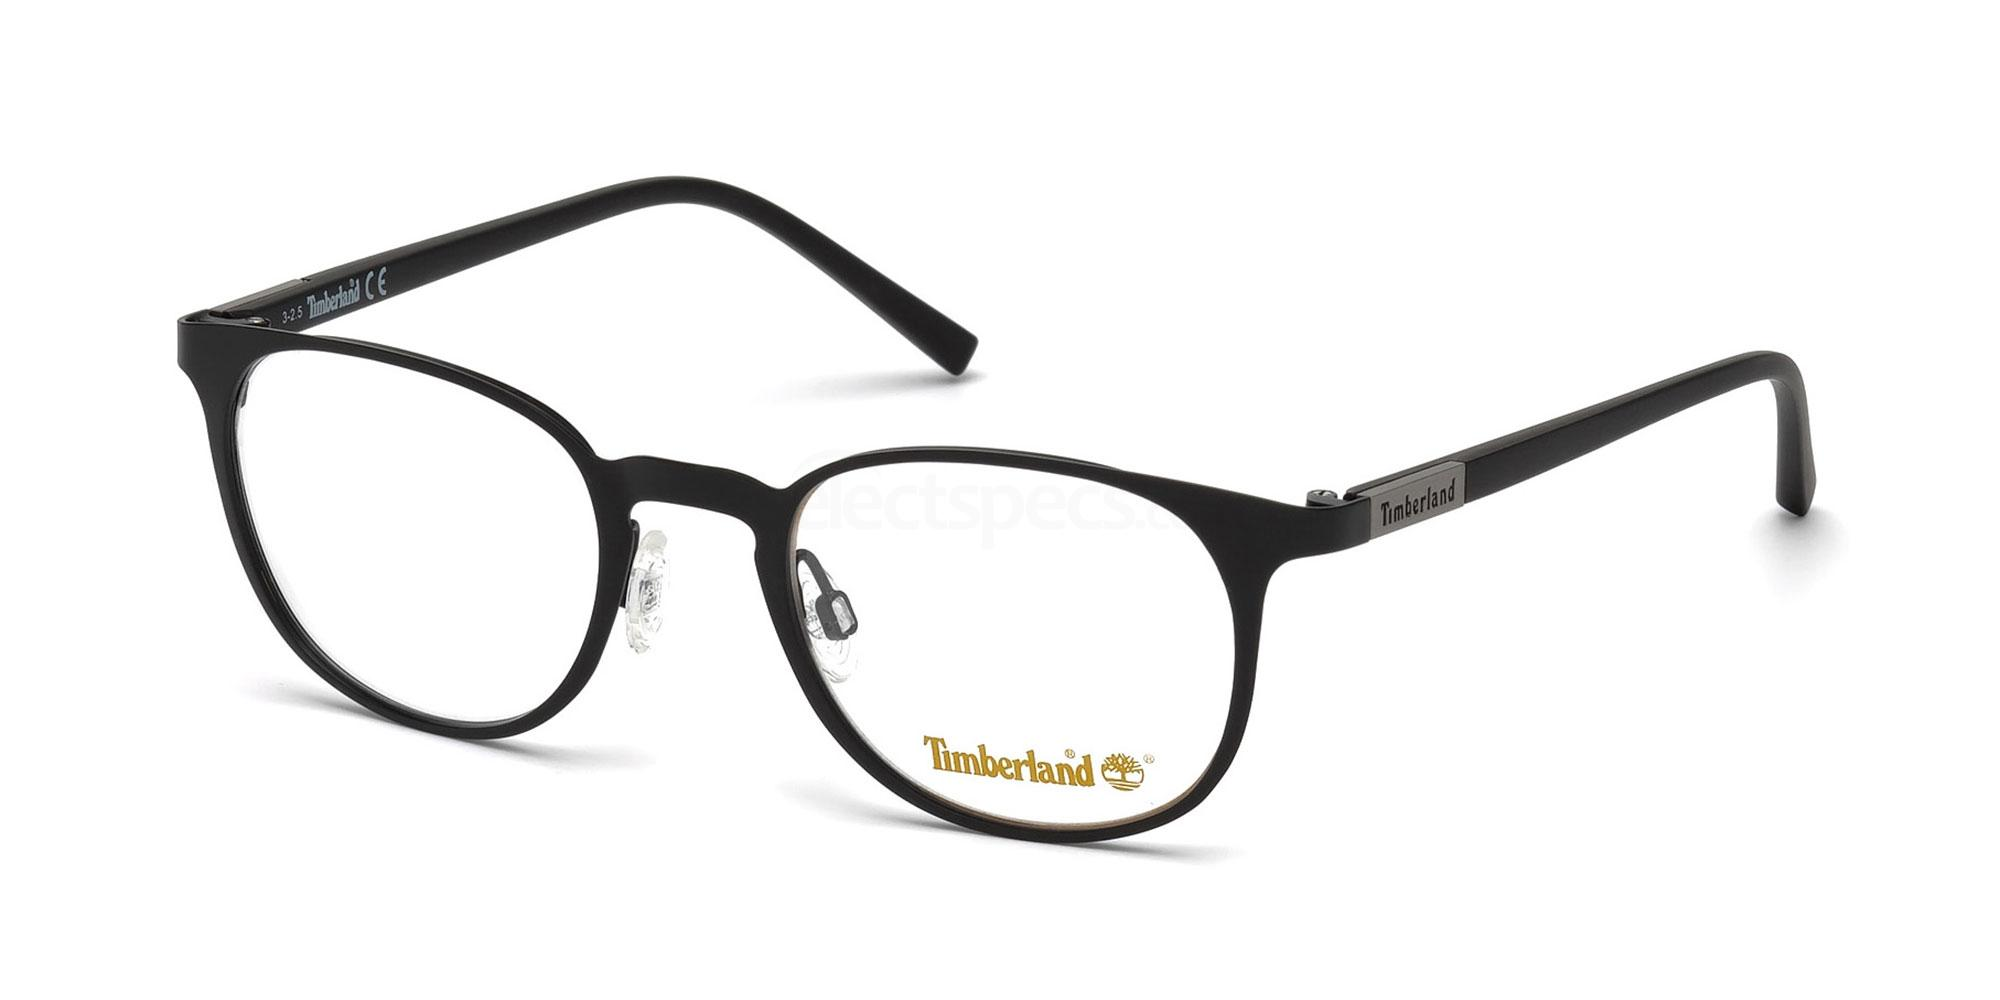 002 TB1365 Glasses, Timberland